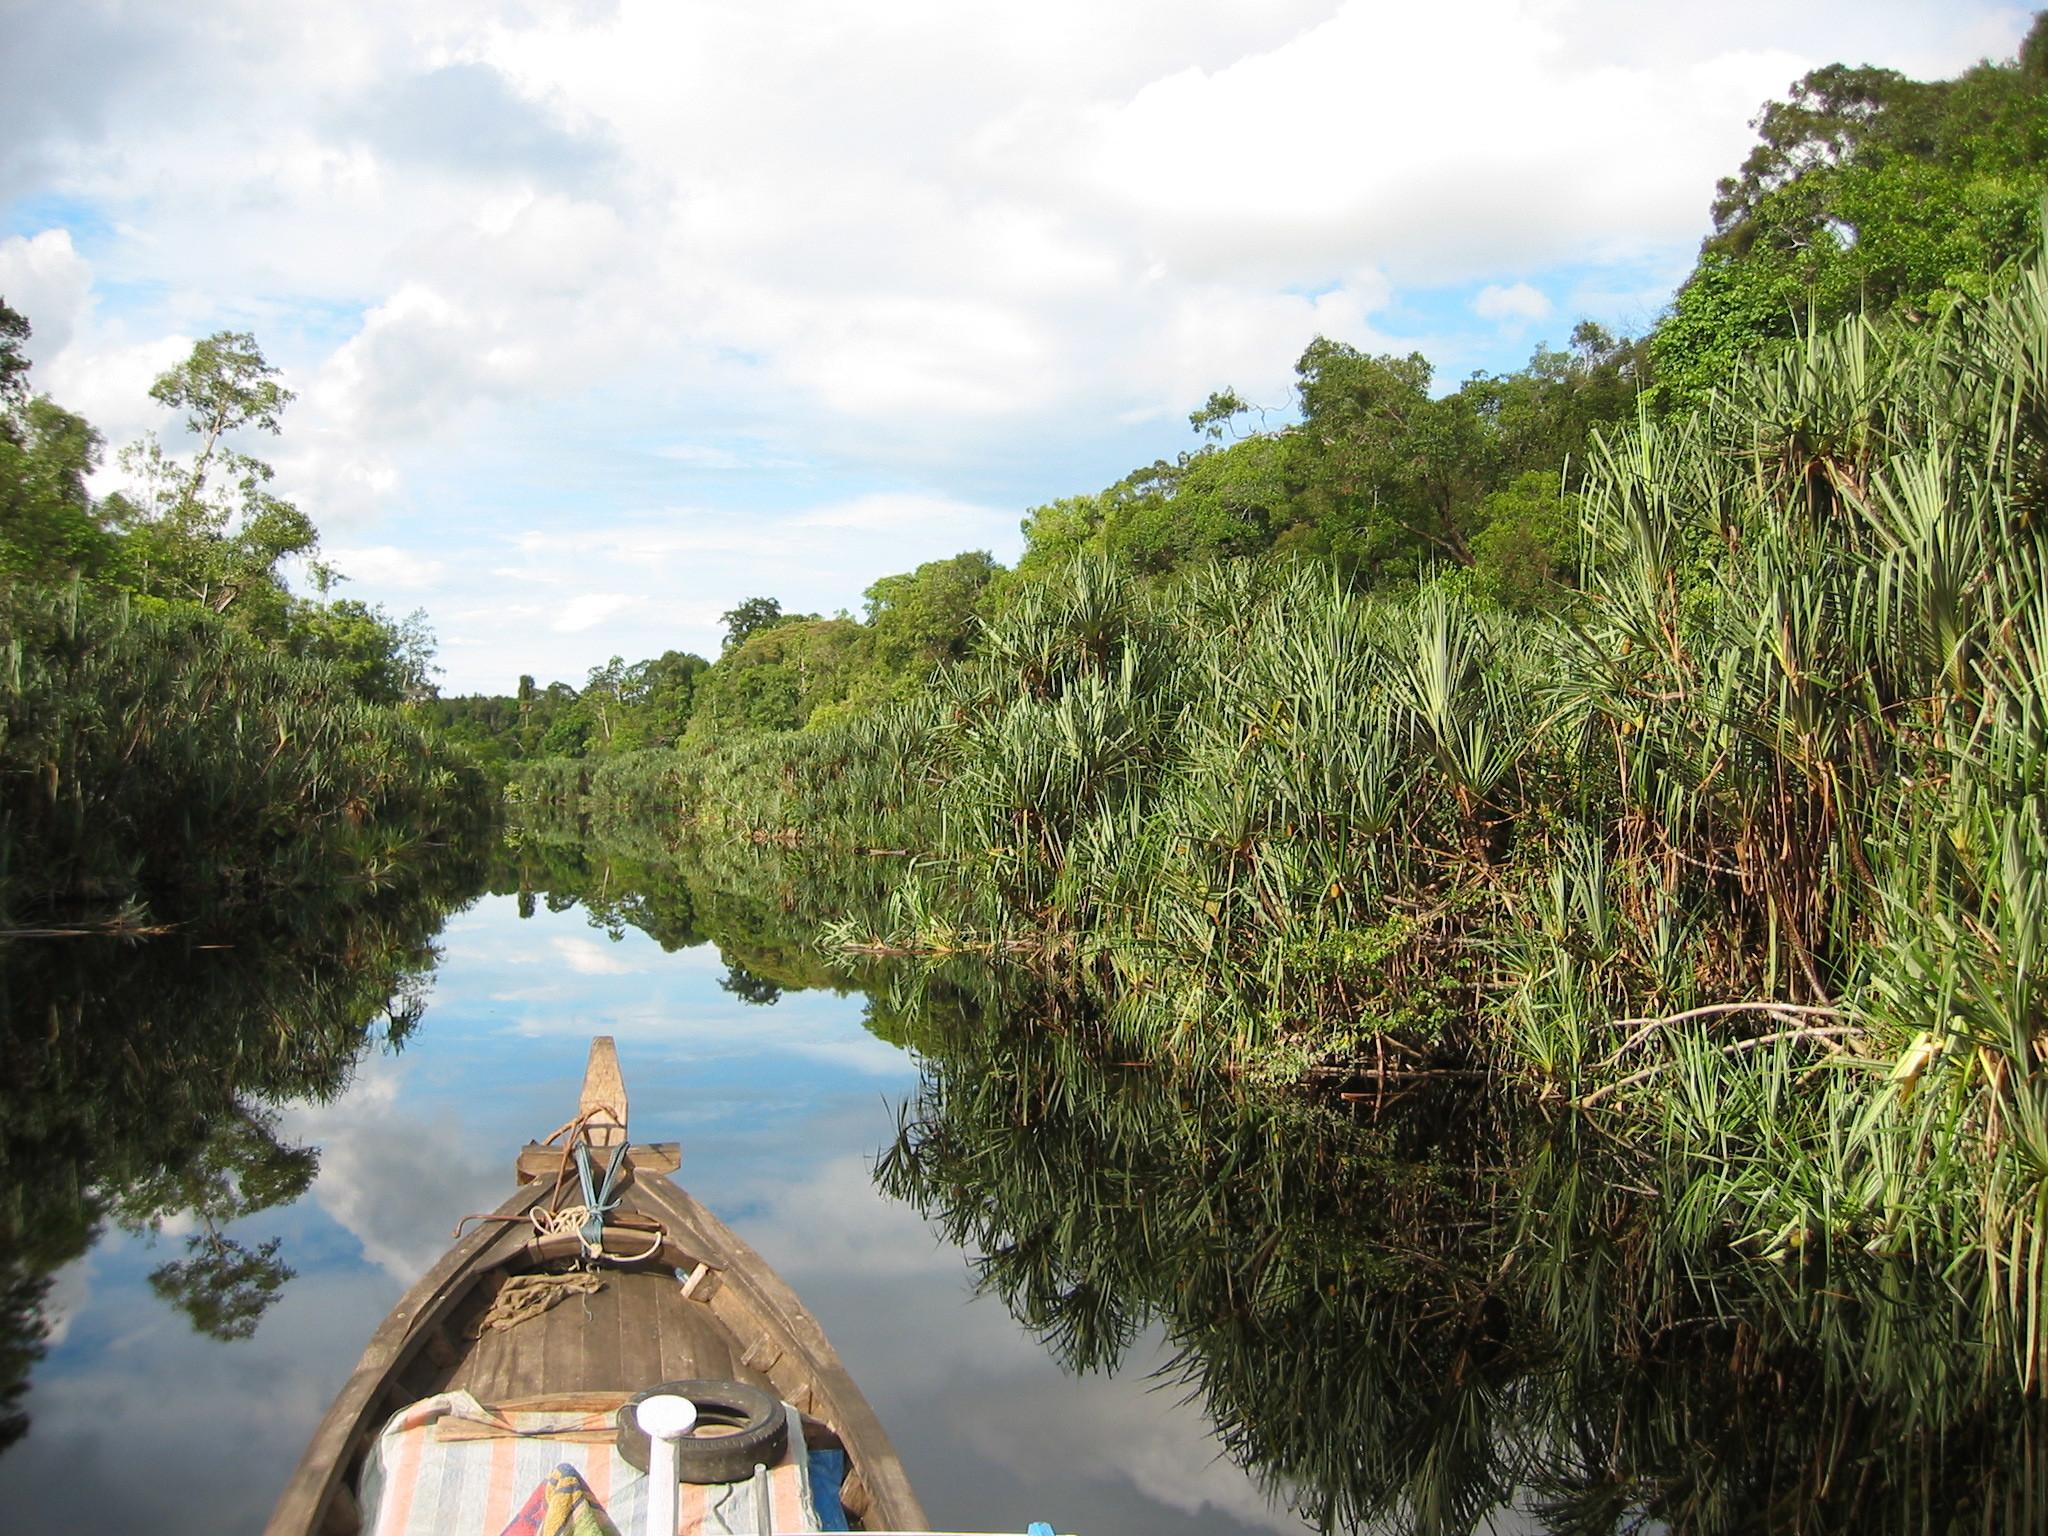 3-WG- Pristine peatswamp forest in Berbak National Park (Sumatra)